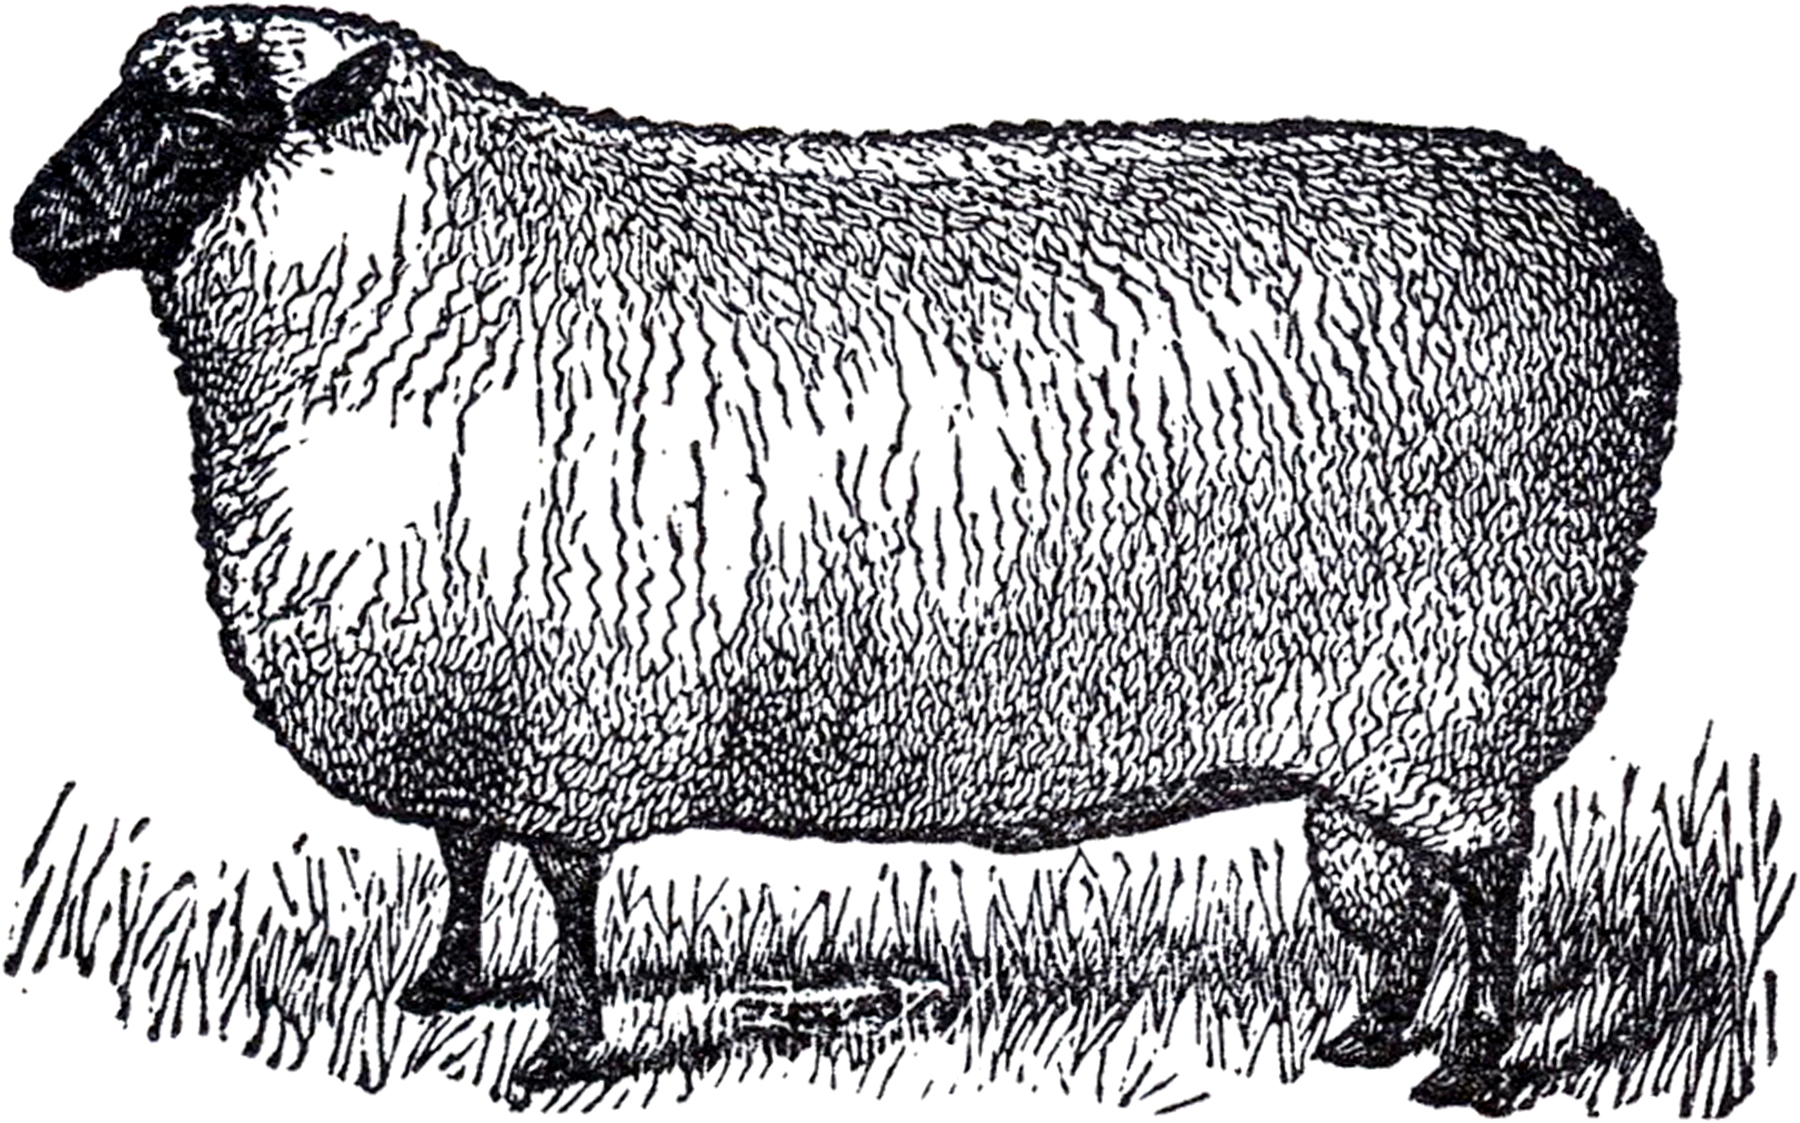 Primitive image the graphics. Sheep clipart vintage